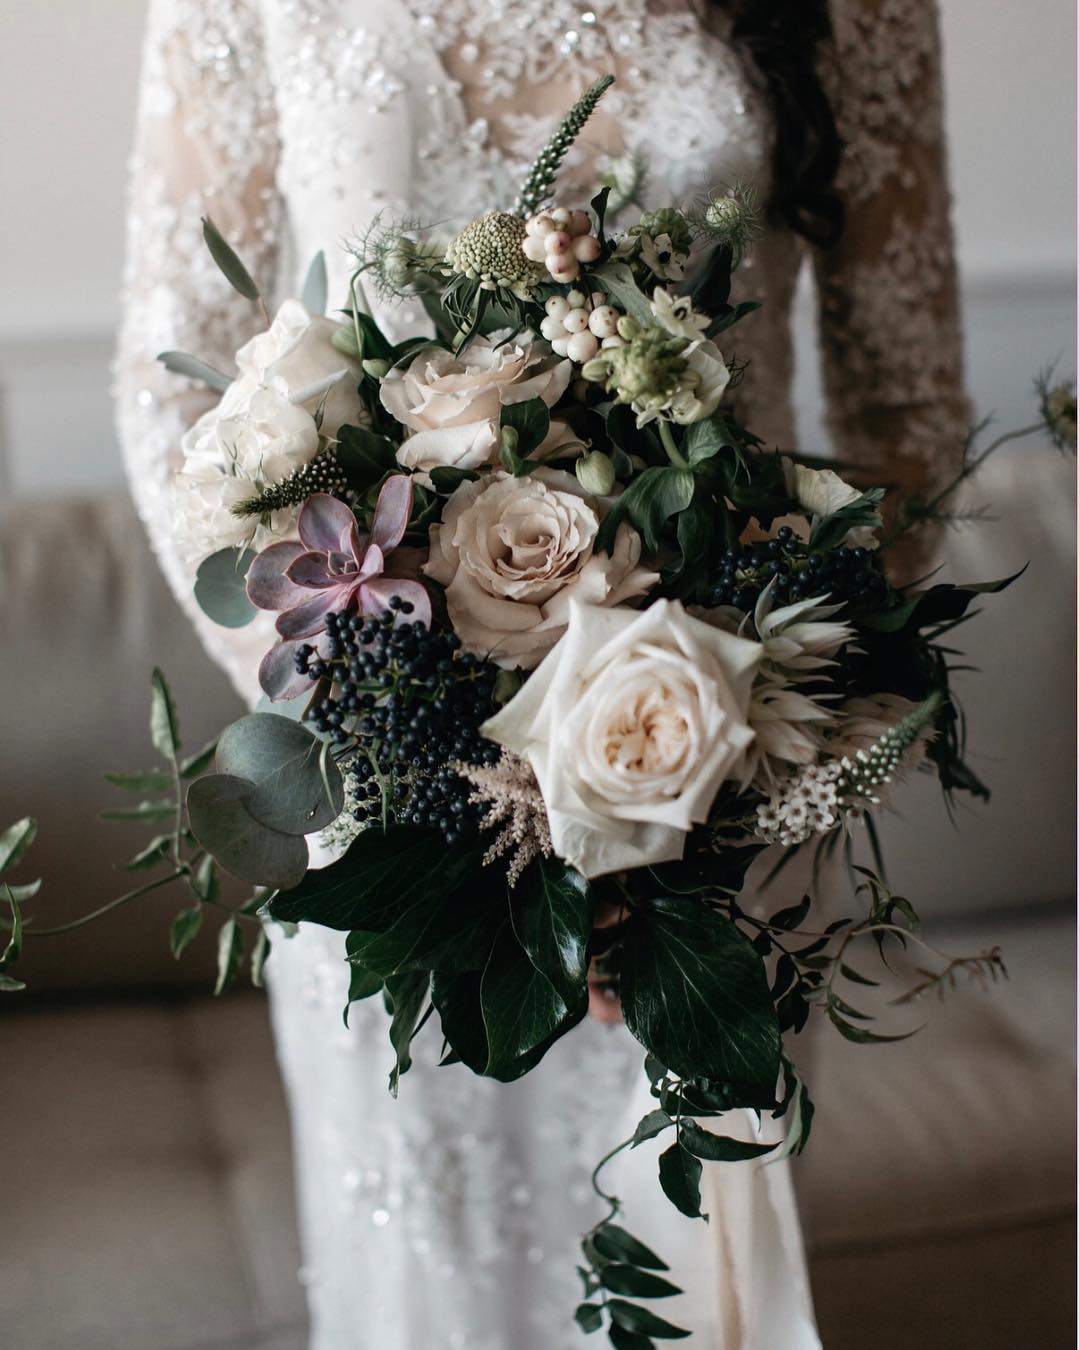 {love} photo | @jessjolinphotography . . . #gorgeousness #brideflowers #inlove #bridebouquet #amazingpic #sopretty #lush #florals #whimsical #roses #berries #greenery #interesting #lotusfloraldesigns